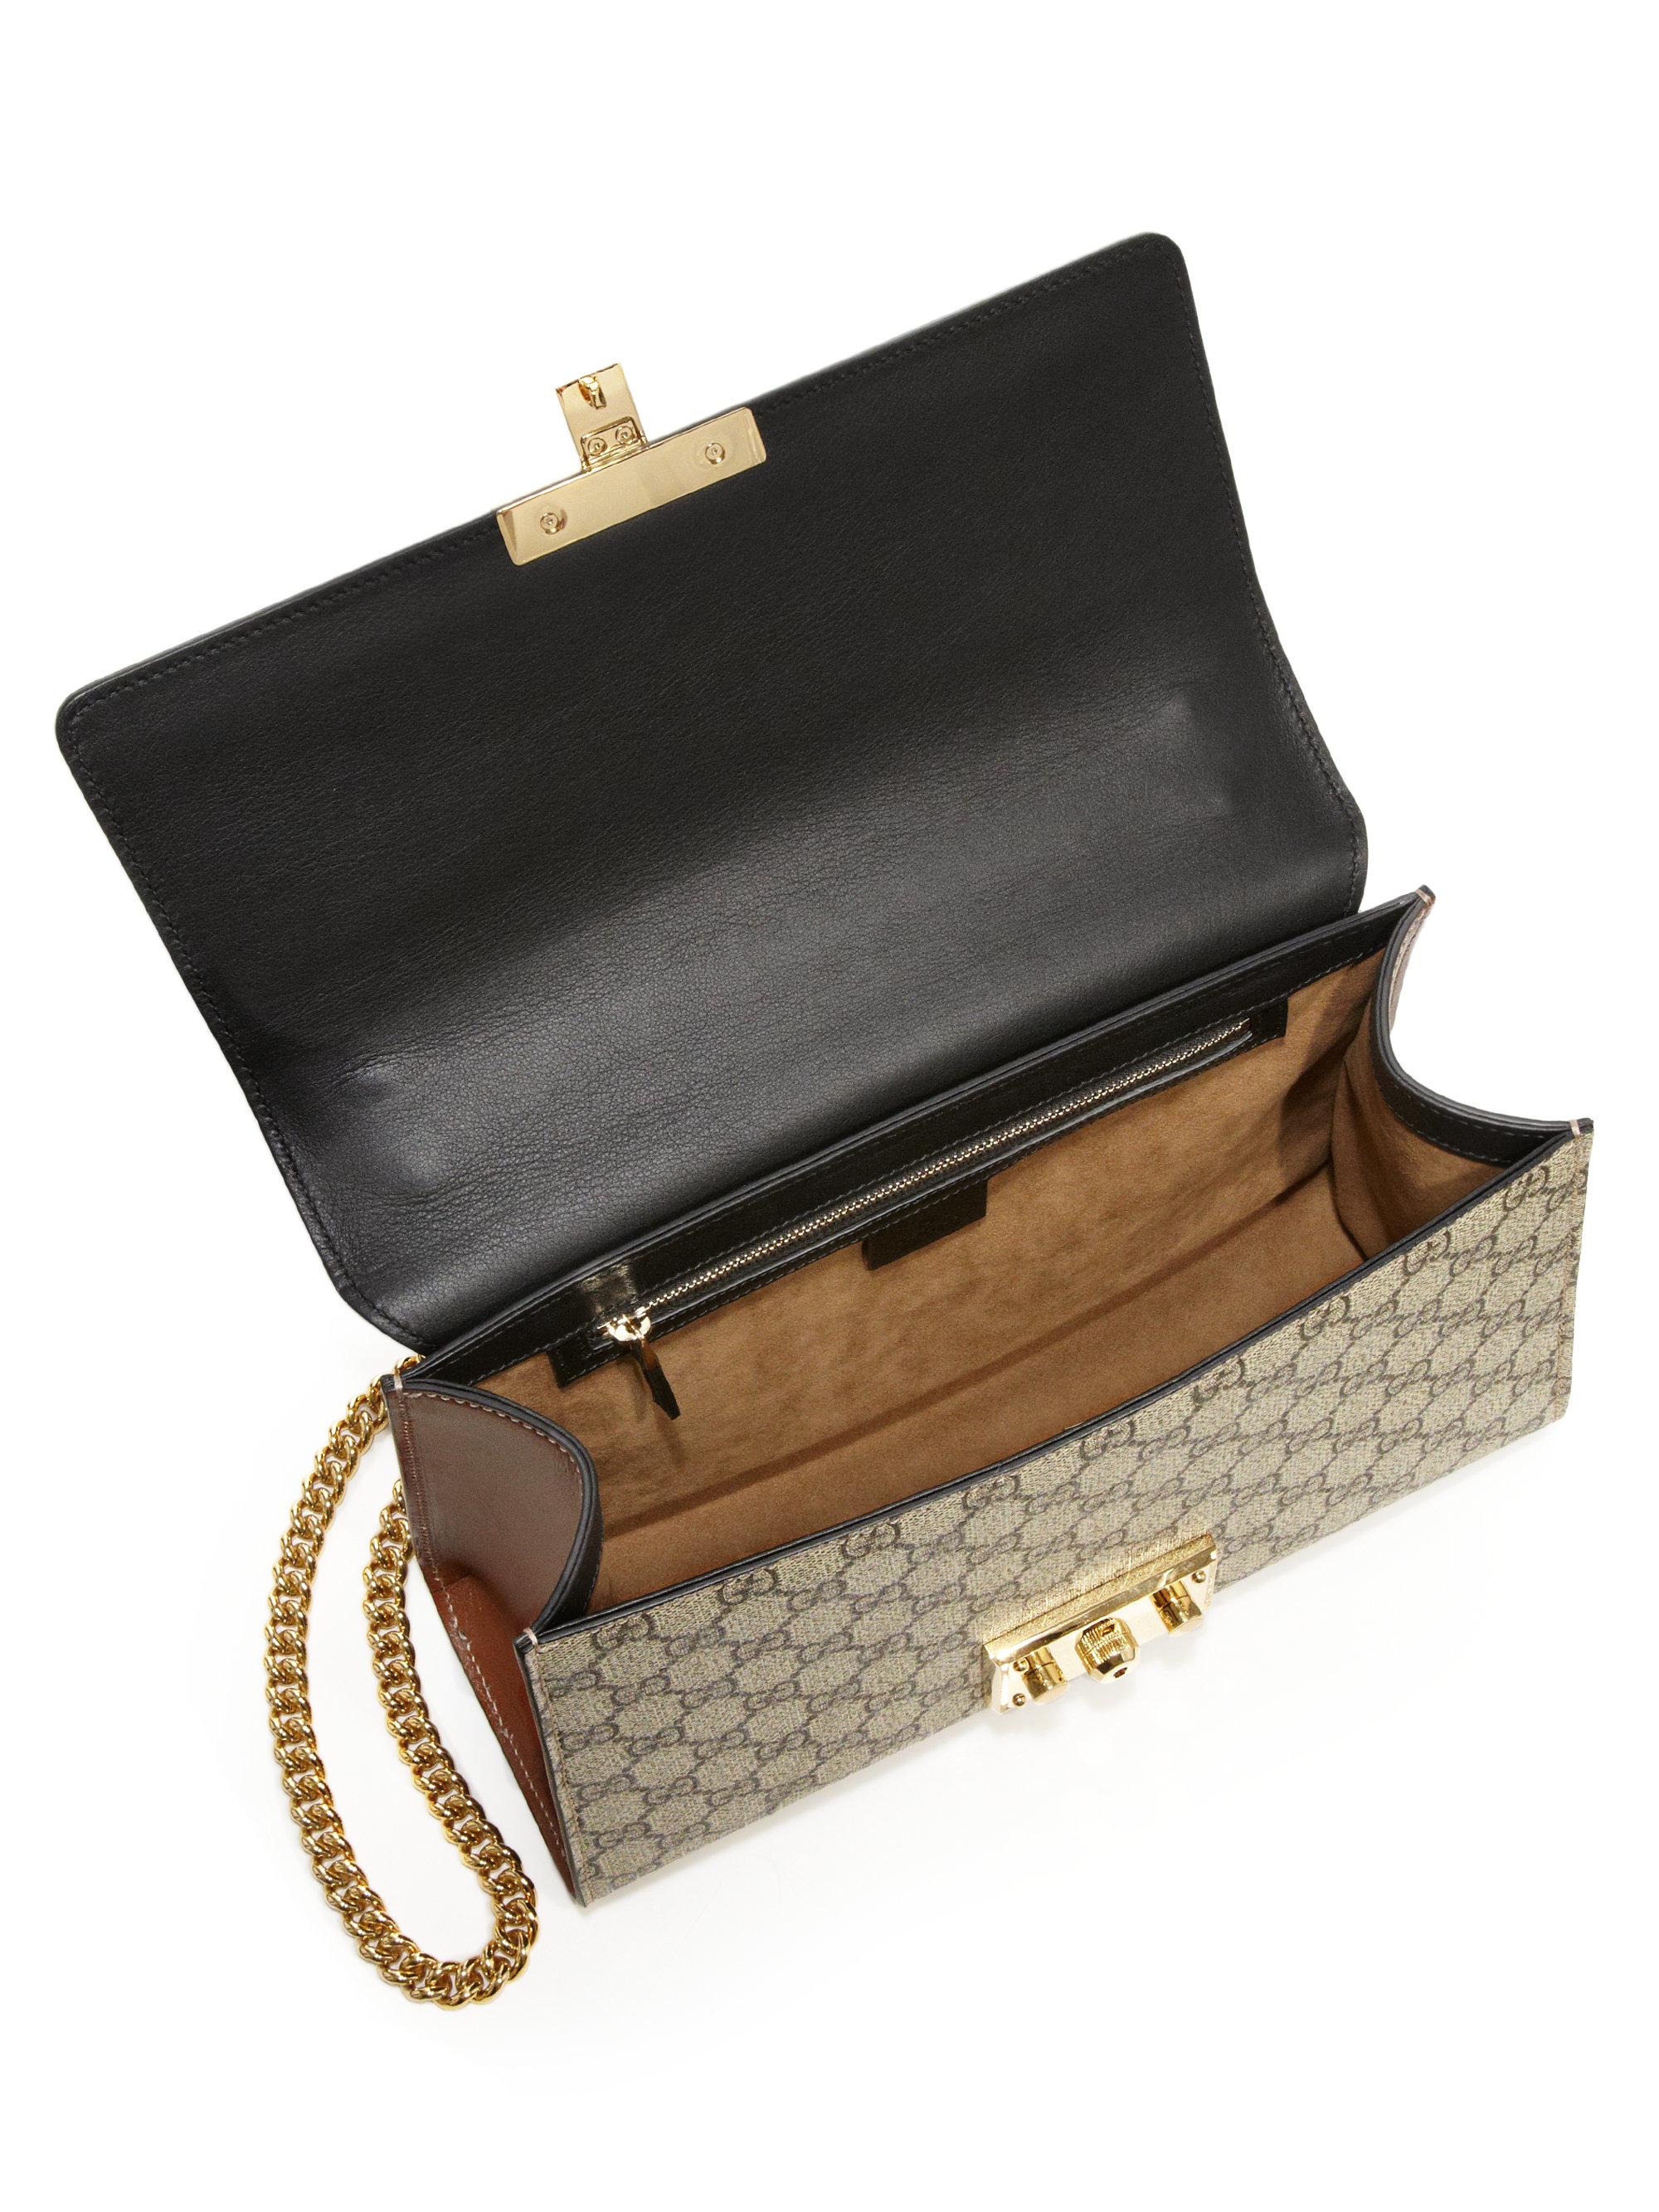 bbe32bea Gucci Padlock Gg Supreme Medium Shoulder Bag in Black - Lyst